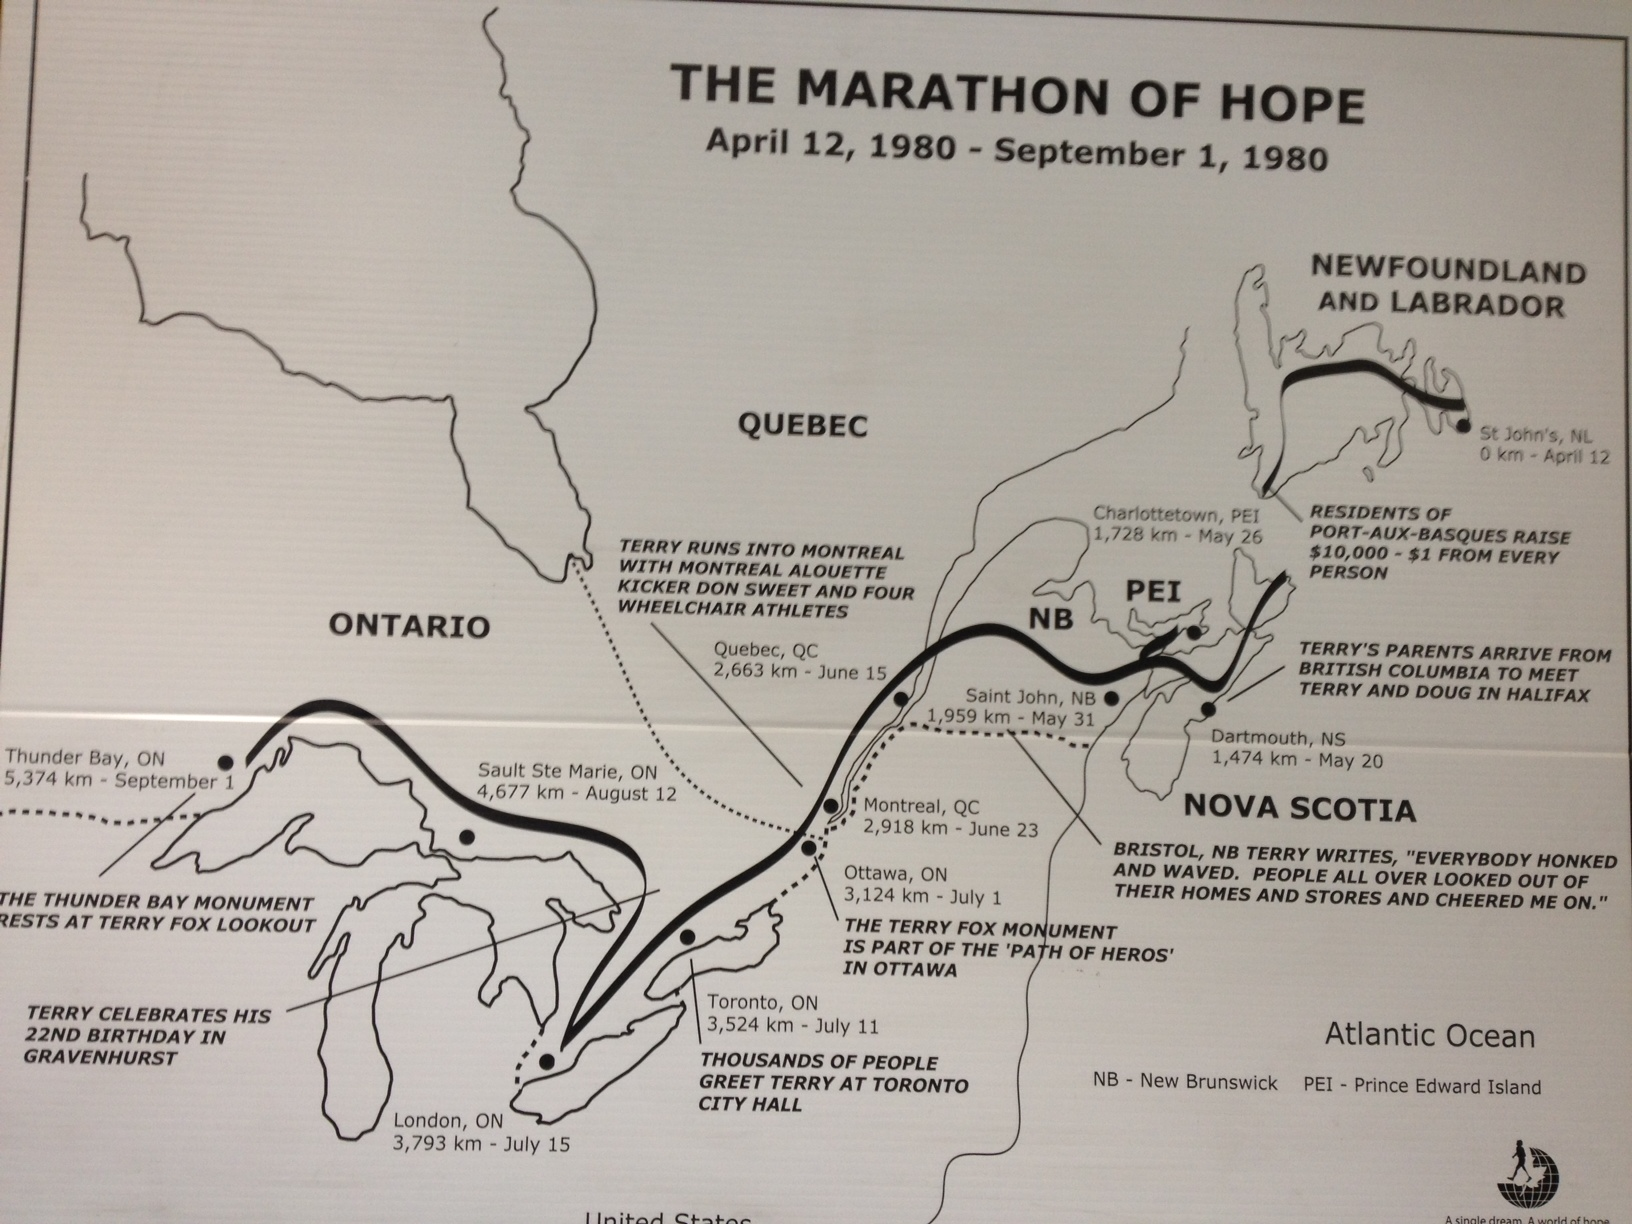 terry fox run on laura secord map, fred hutchinson map, samuel de champlain map, mother teresa map,